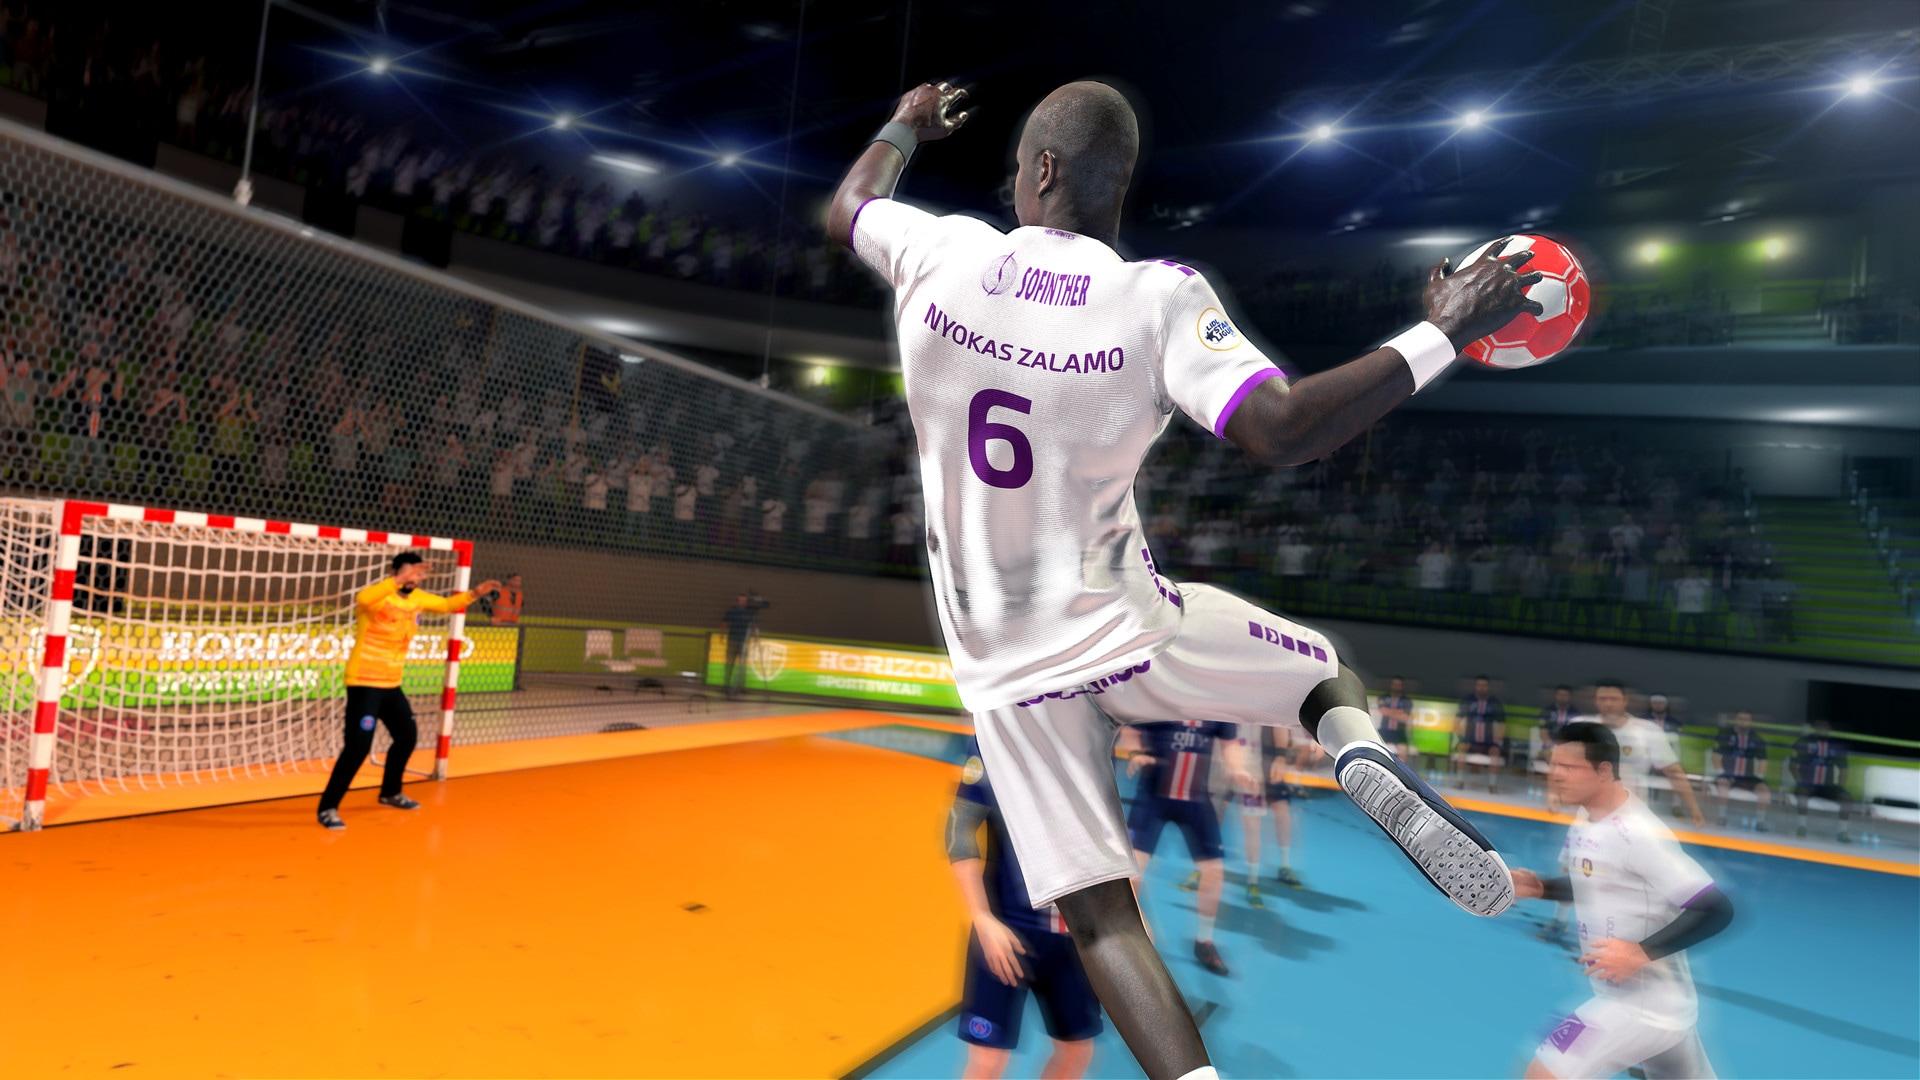 Handball 21 (PC) - Steam Gift - JAPAN - 2